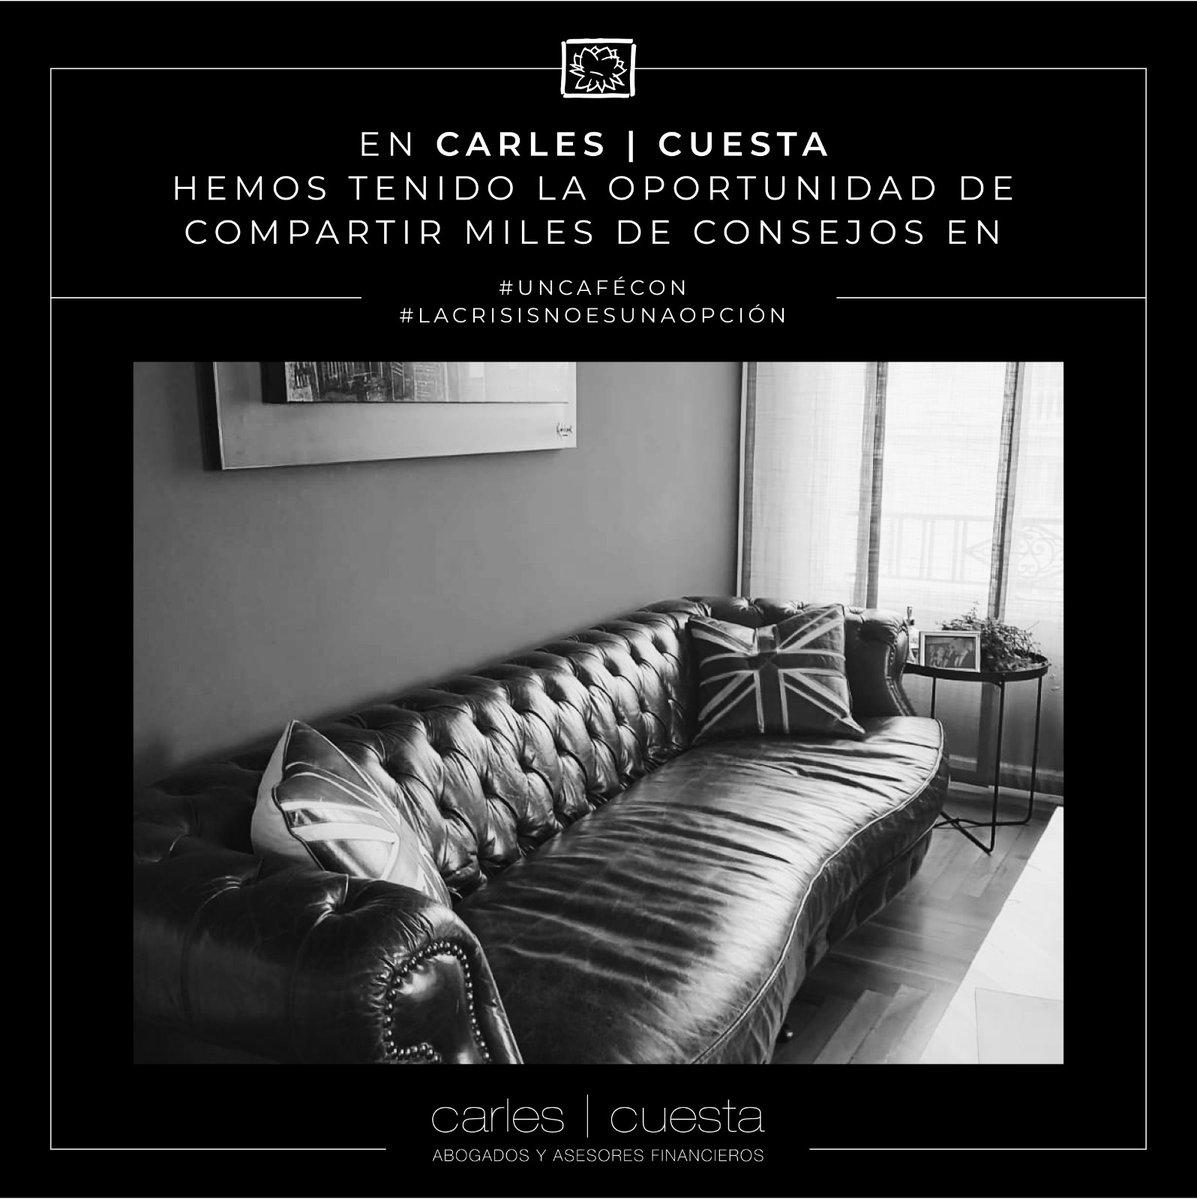 carles_cuesta photo